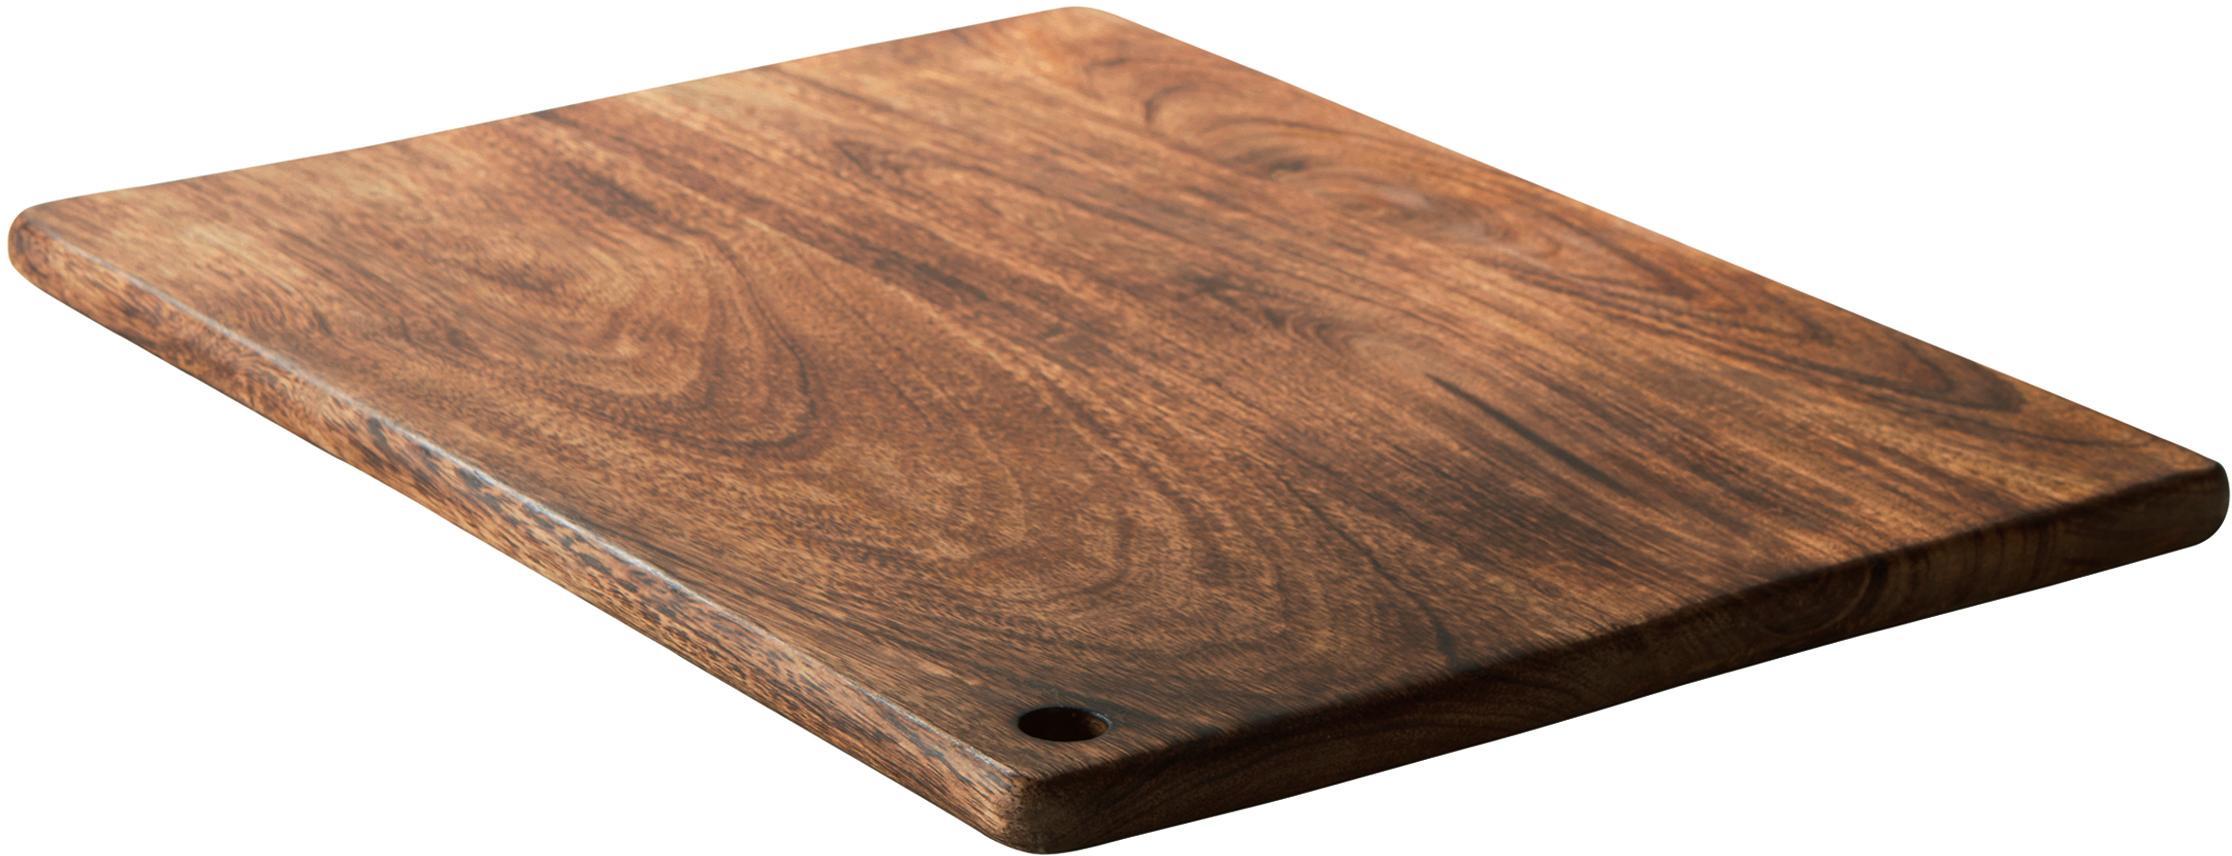 Schneidebrett Colton, Mangoholz, Mangoholz, B 40 x T 30 cm